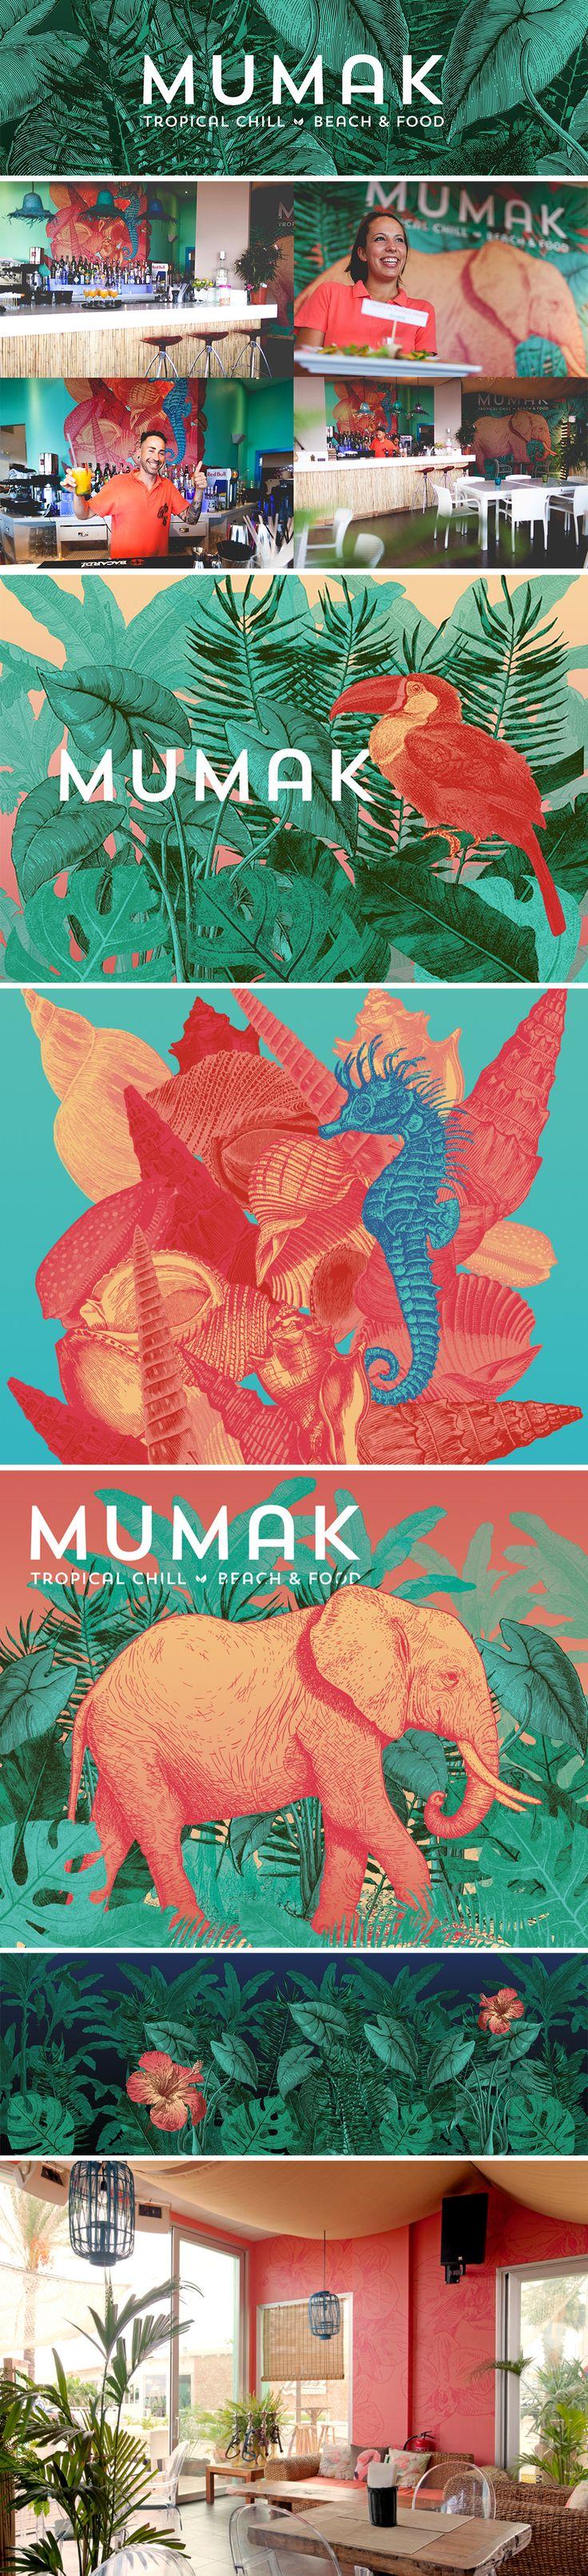 Brand for Mumak, a tropical restaurant in Ibiza